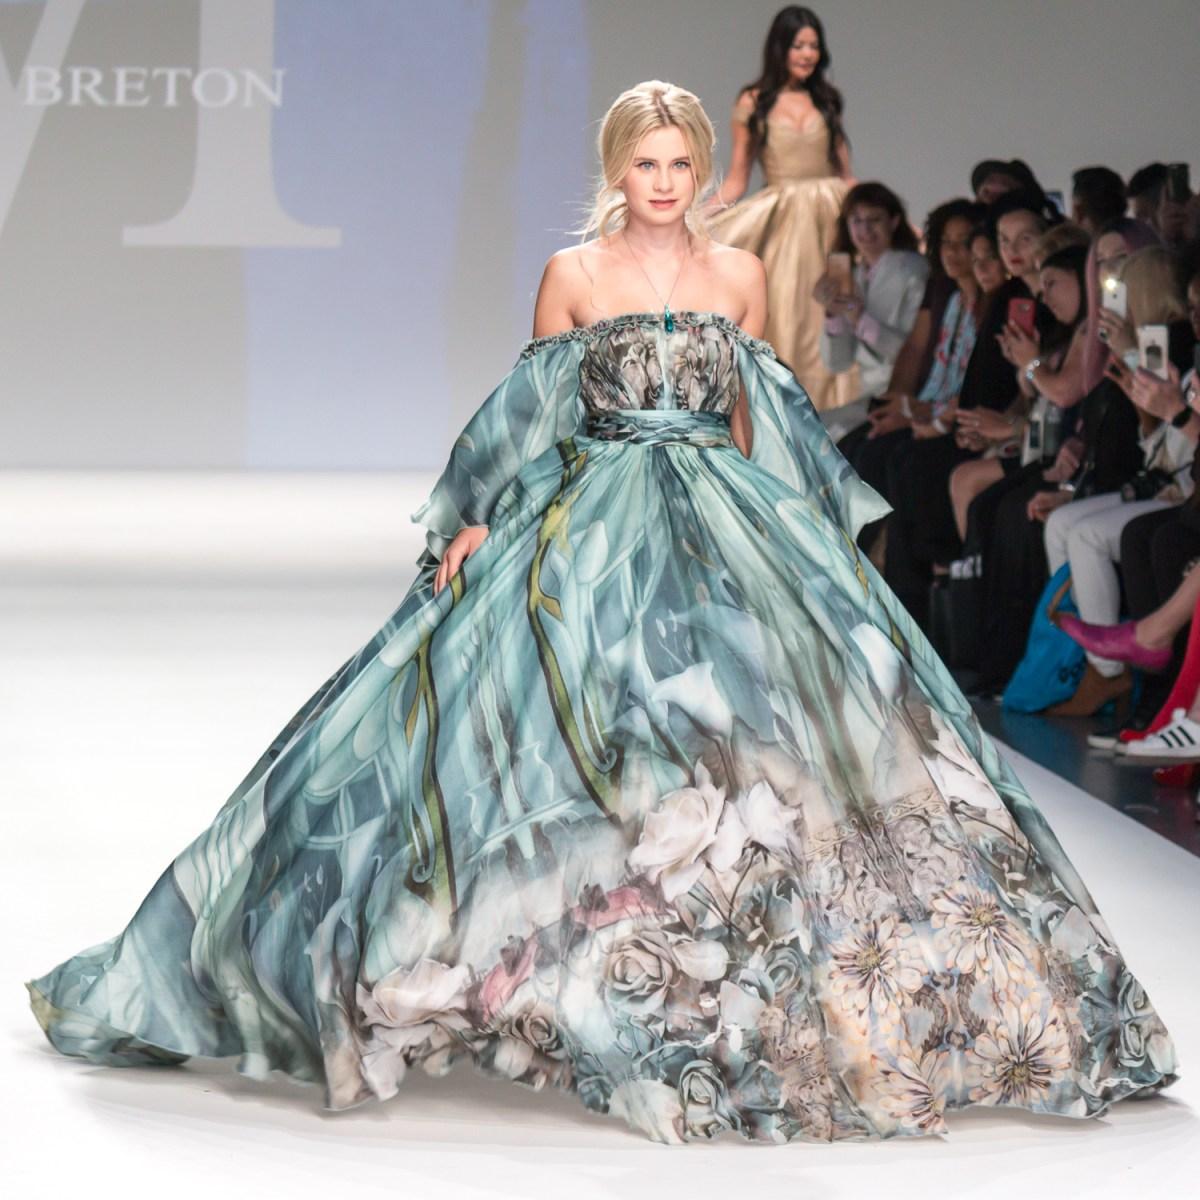 Malan Breton Opens StyleFWNY